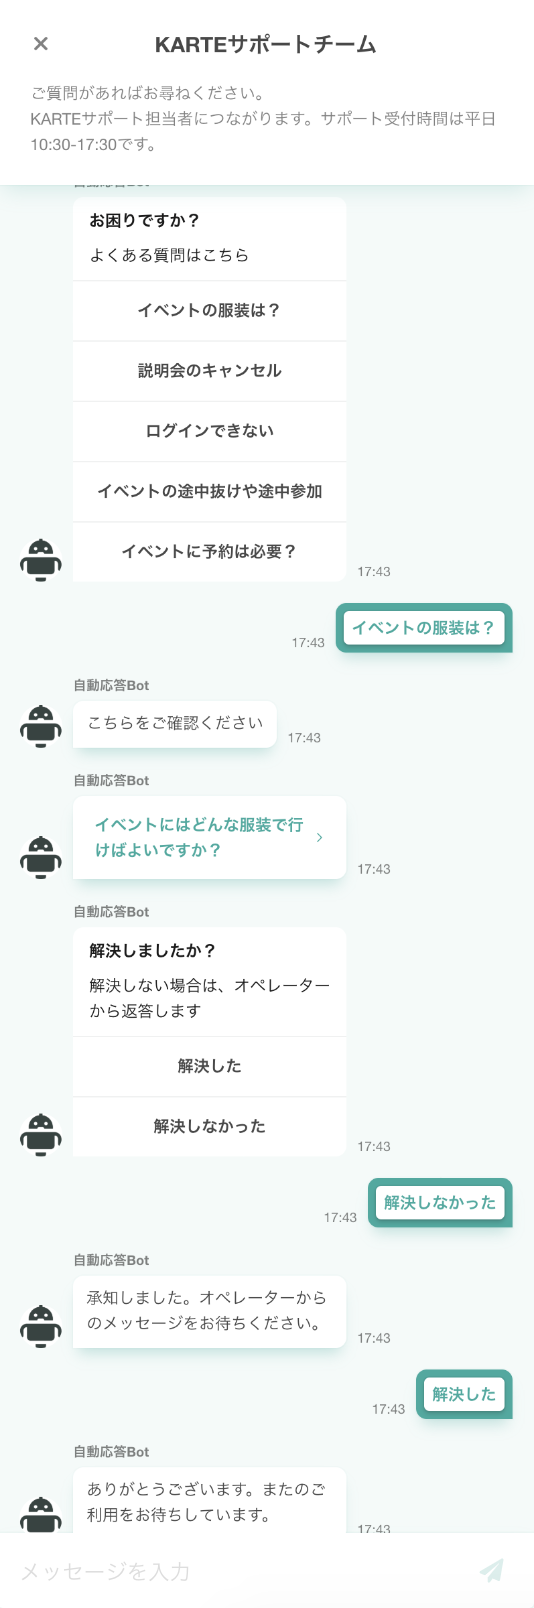 Botの自動応答設定機能(オープンβ版) | ドキュメント / トーク ...